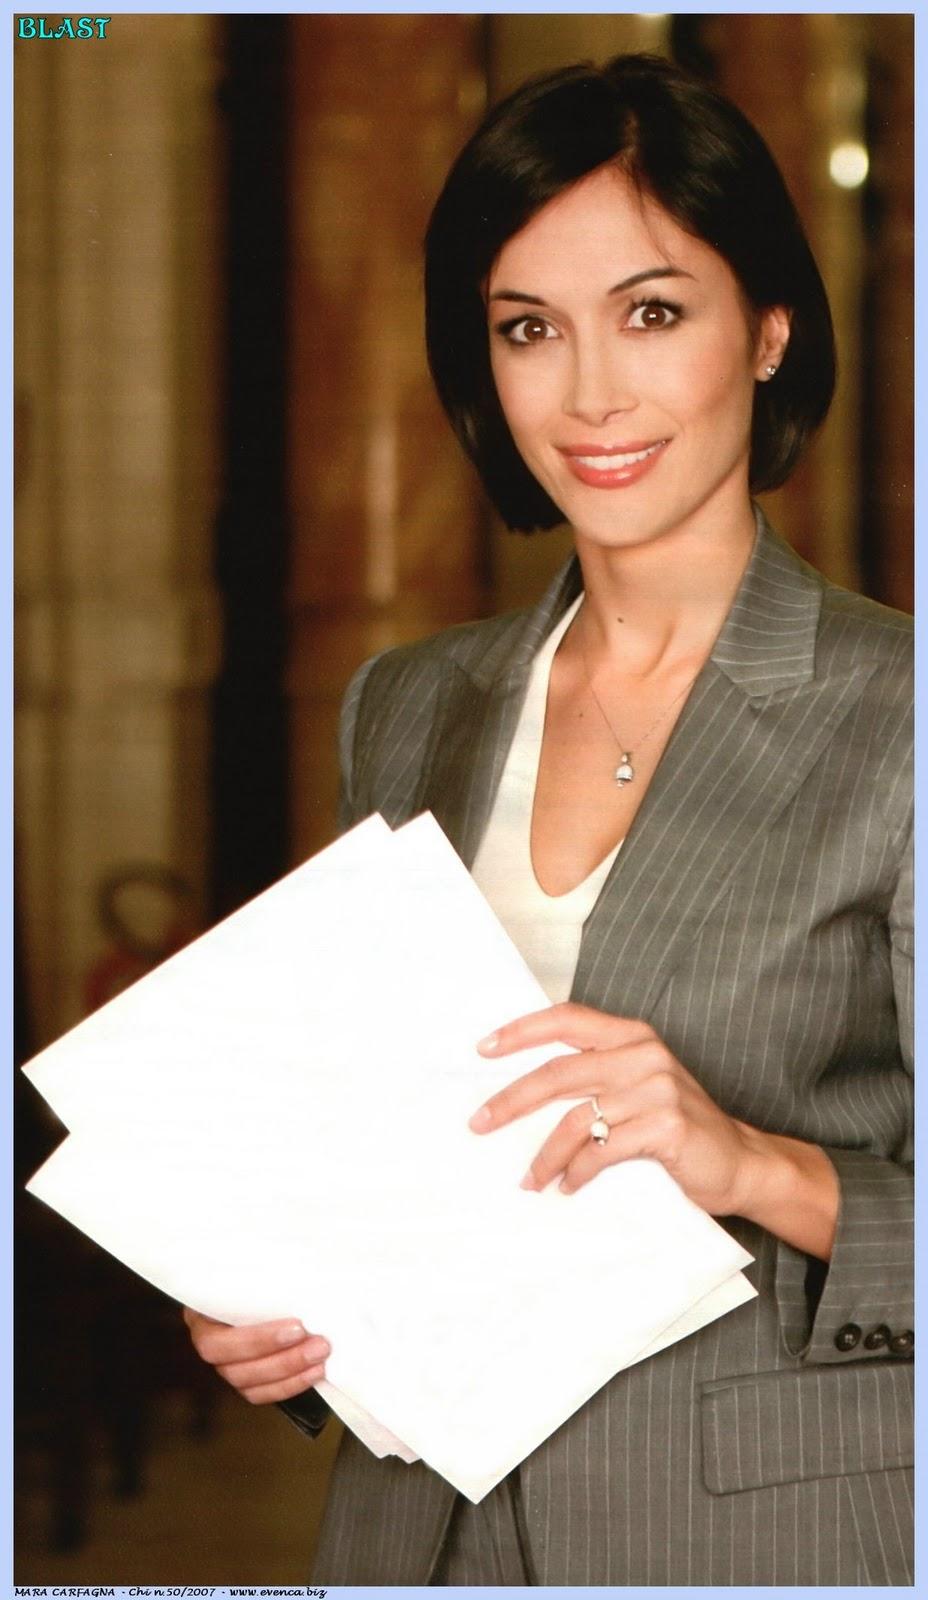 Online Photography Degree >> ShimShim: Maria Carfagna: World´s Hottest Politician